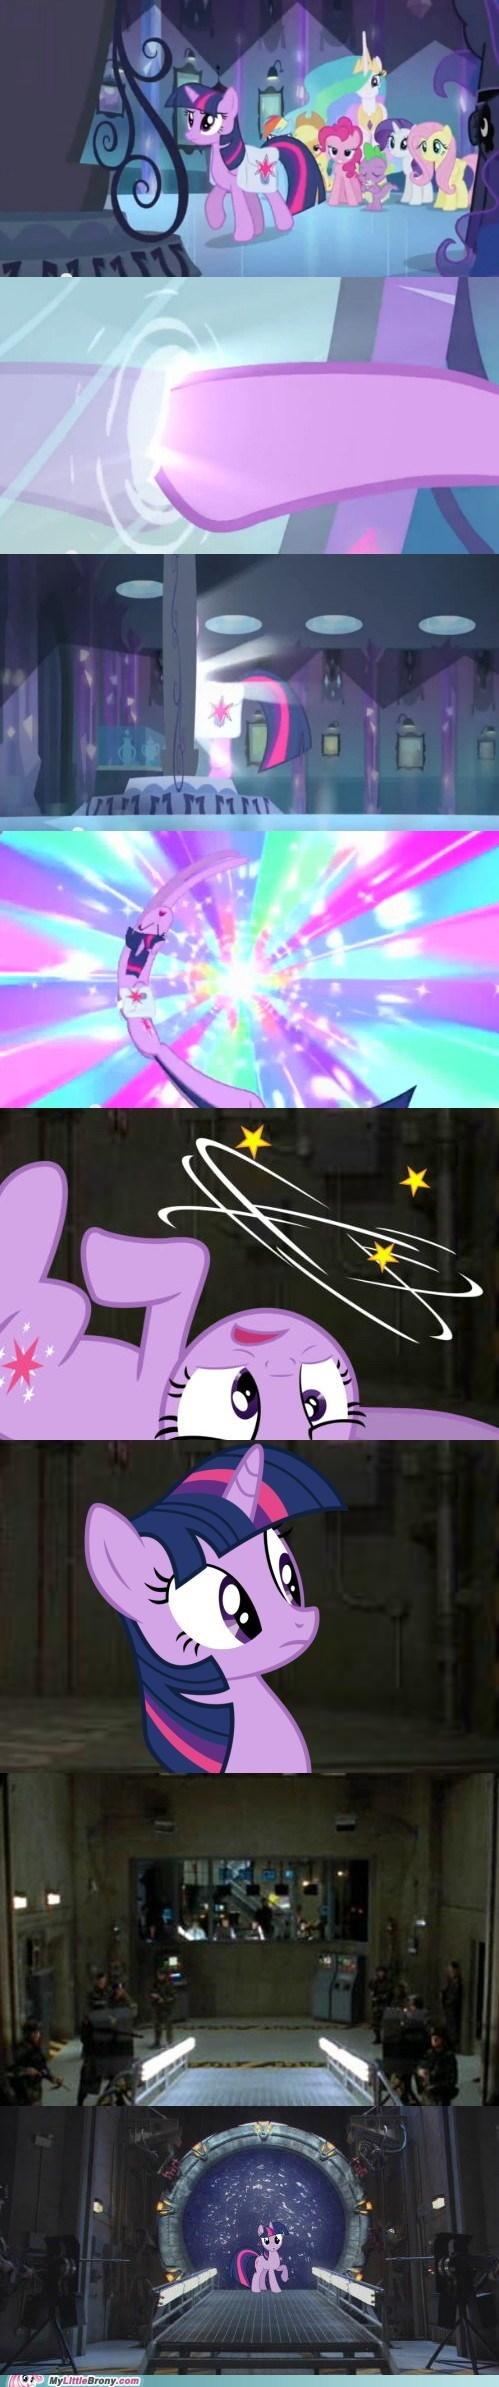 portals twilight sparkle comics Stargate funny - 7463805440